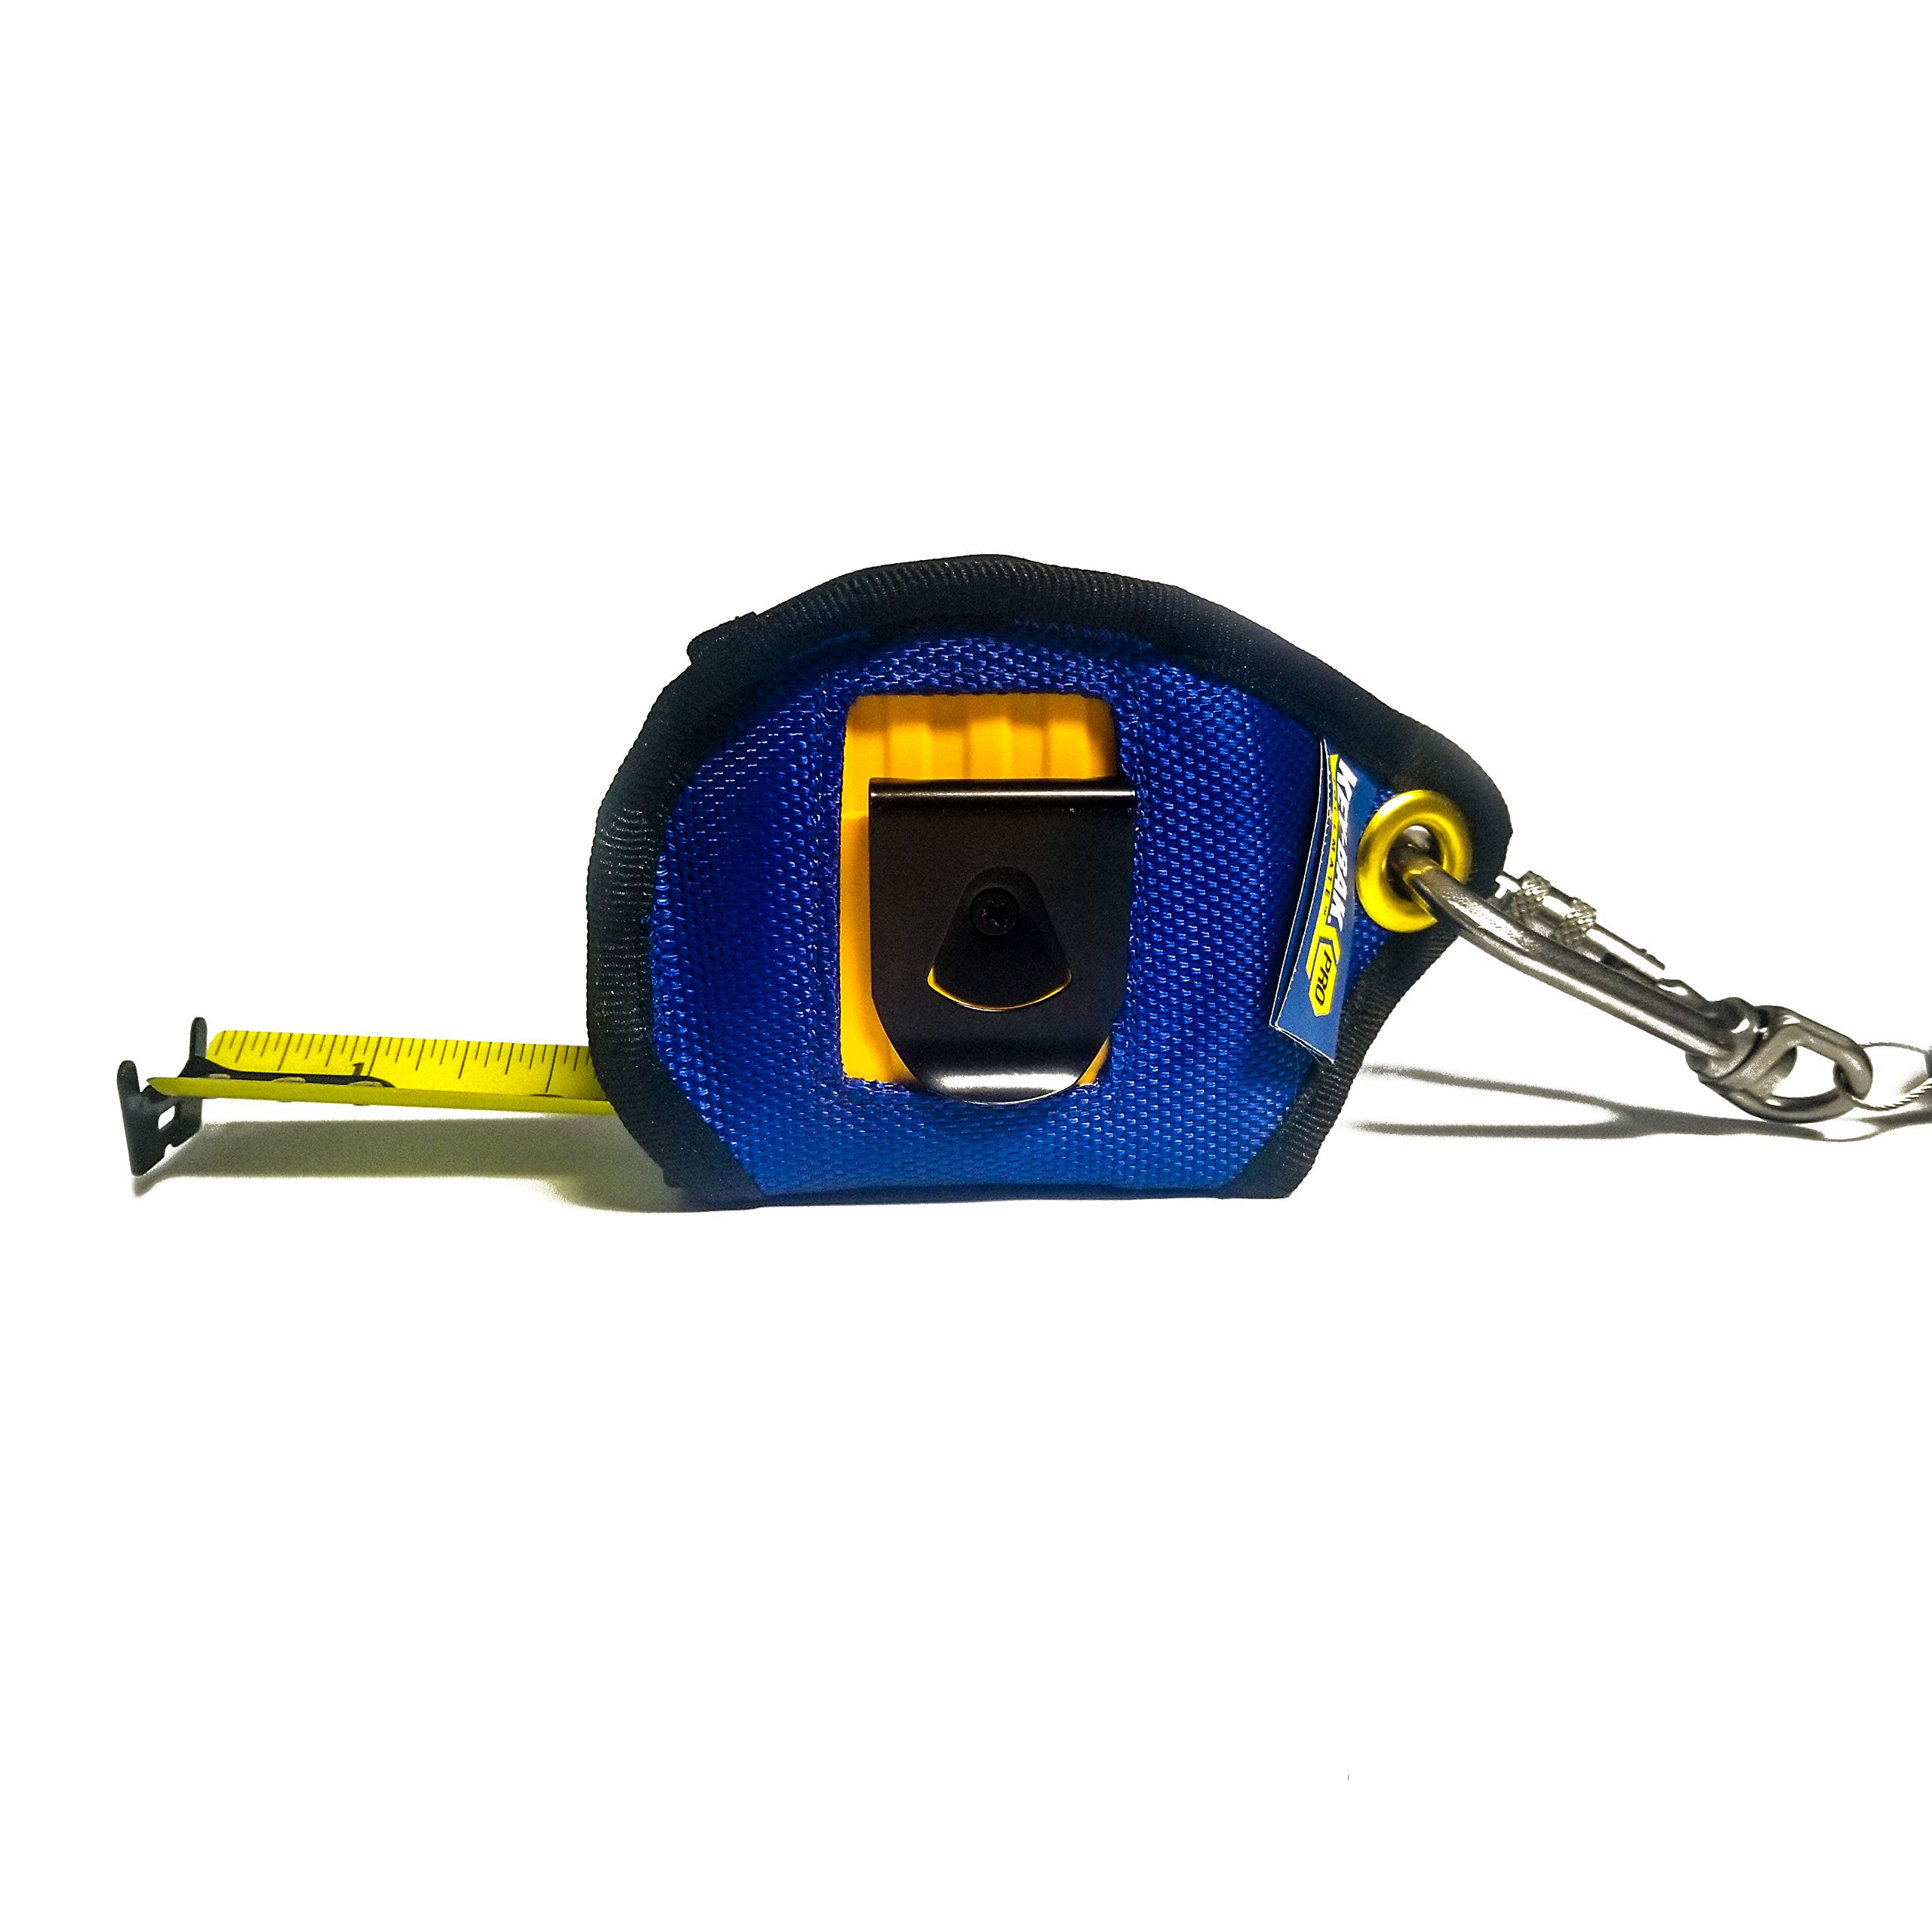 KEY-BAK Pro Toolmate ANSI 121 Compliant Tape Measure Jacket Tool Attachment by Key-Bak Professional (Image #2)